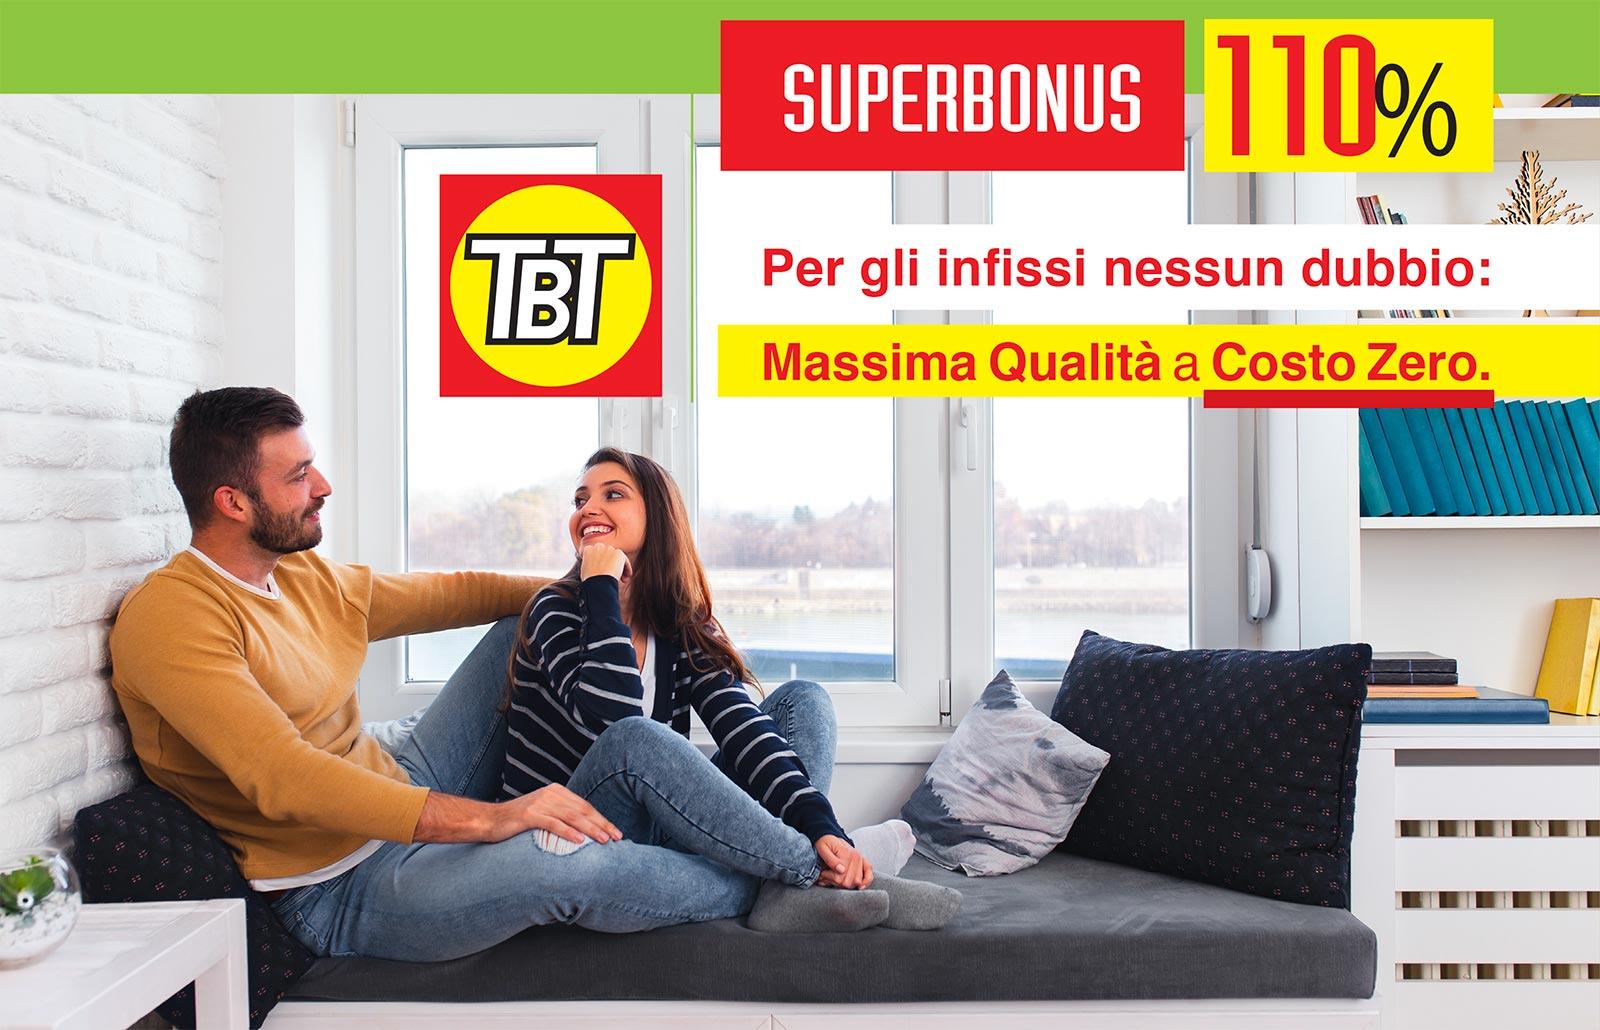 TBT - Superbonus del 110% sugli infissi